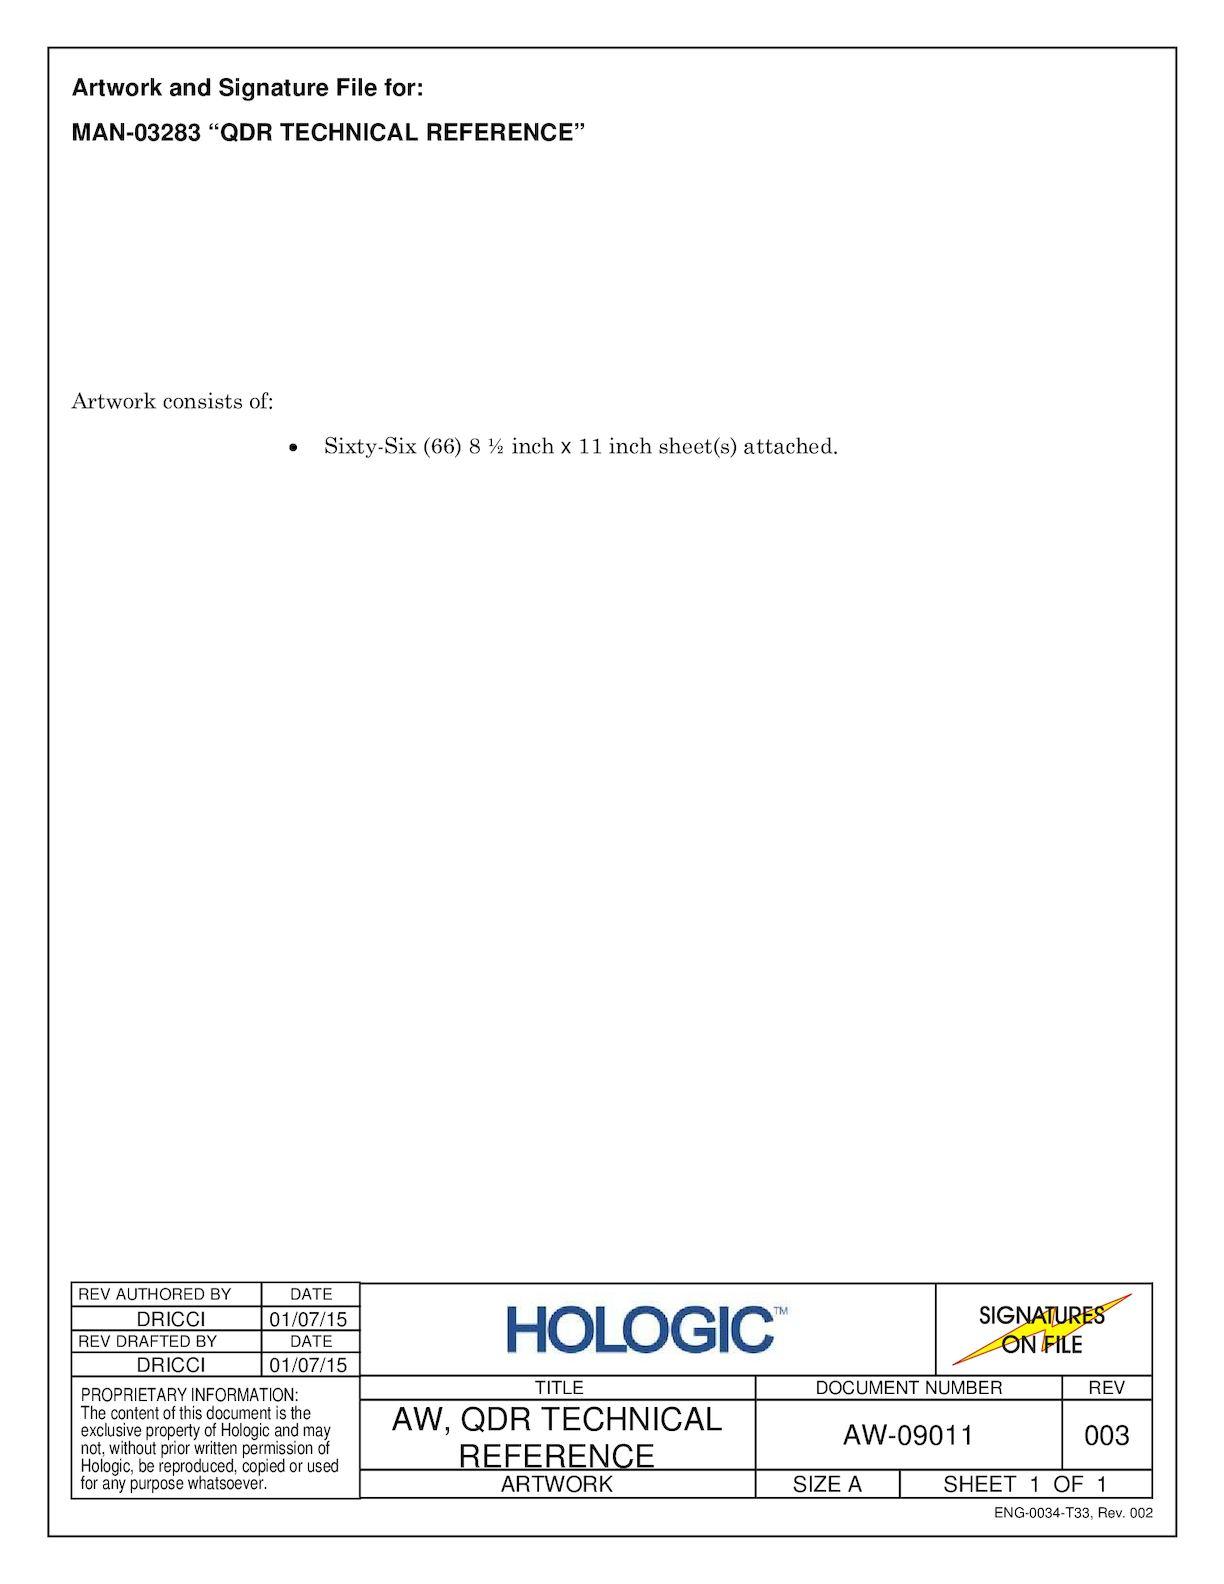 Dxa procedures manual | osteoporosis | image scanner.